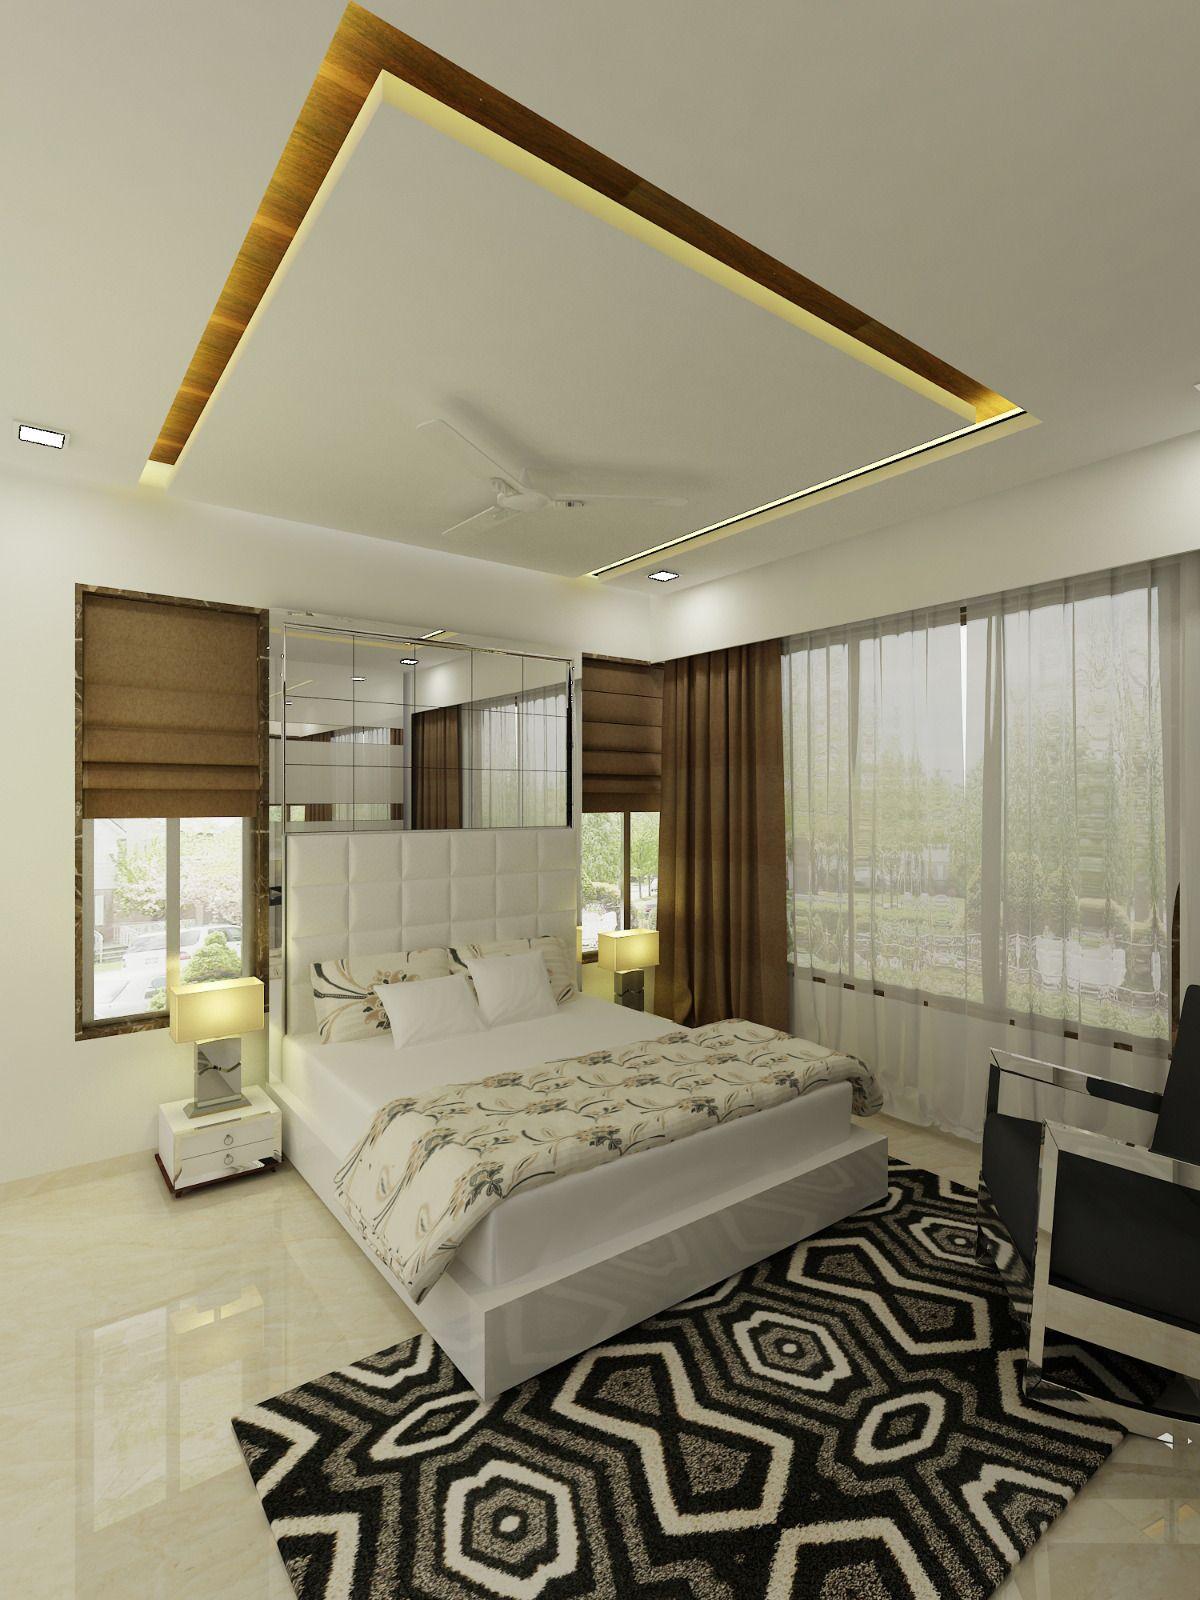 LUXURIOUS MASTER BEDROOM | Bedroom false ceiling design ...